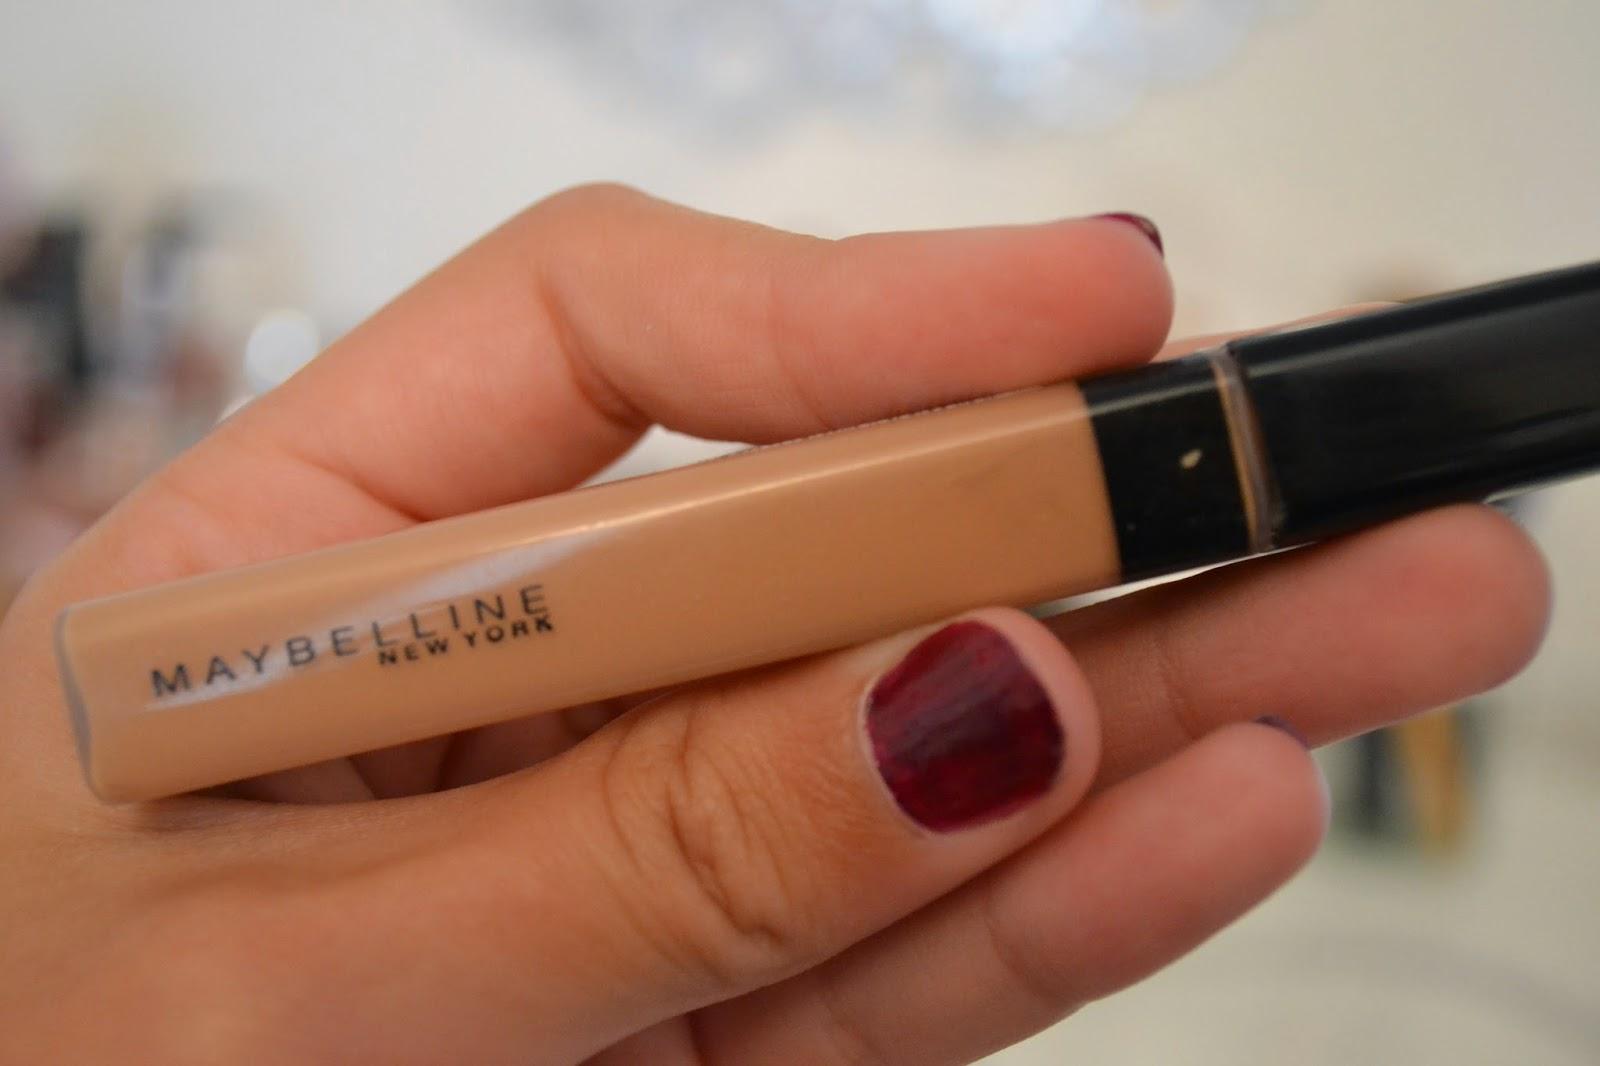 Sophia May Makeup Maybelline Fit Me Concealer Review Saturday 19 April 2014